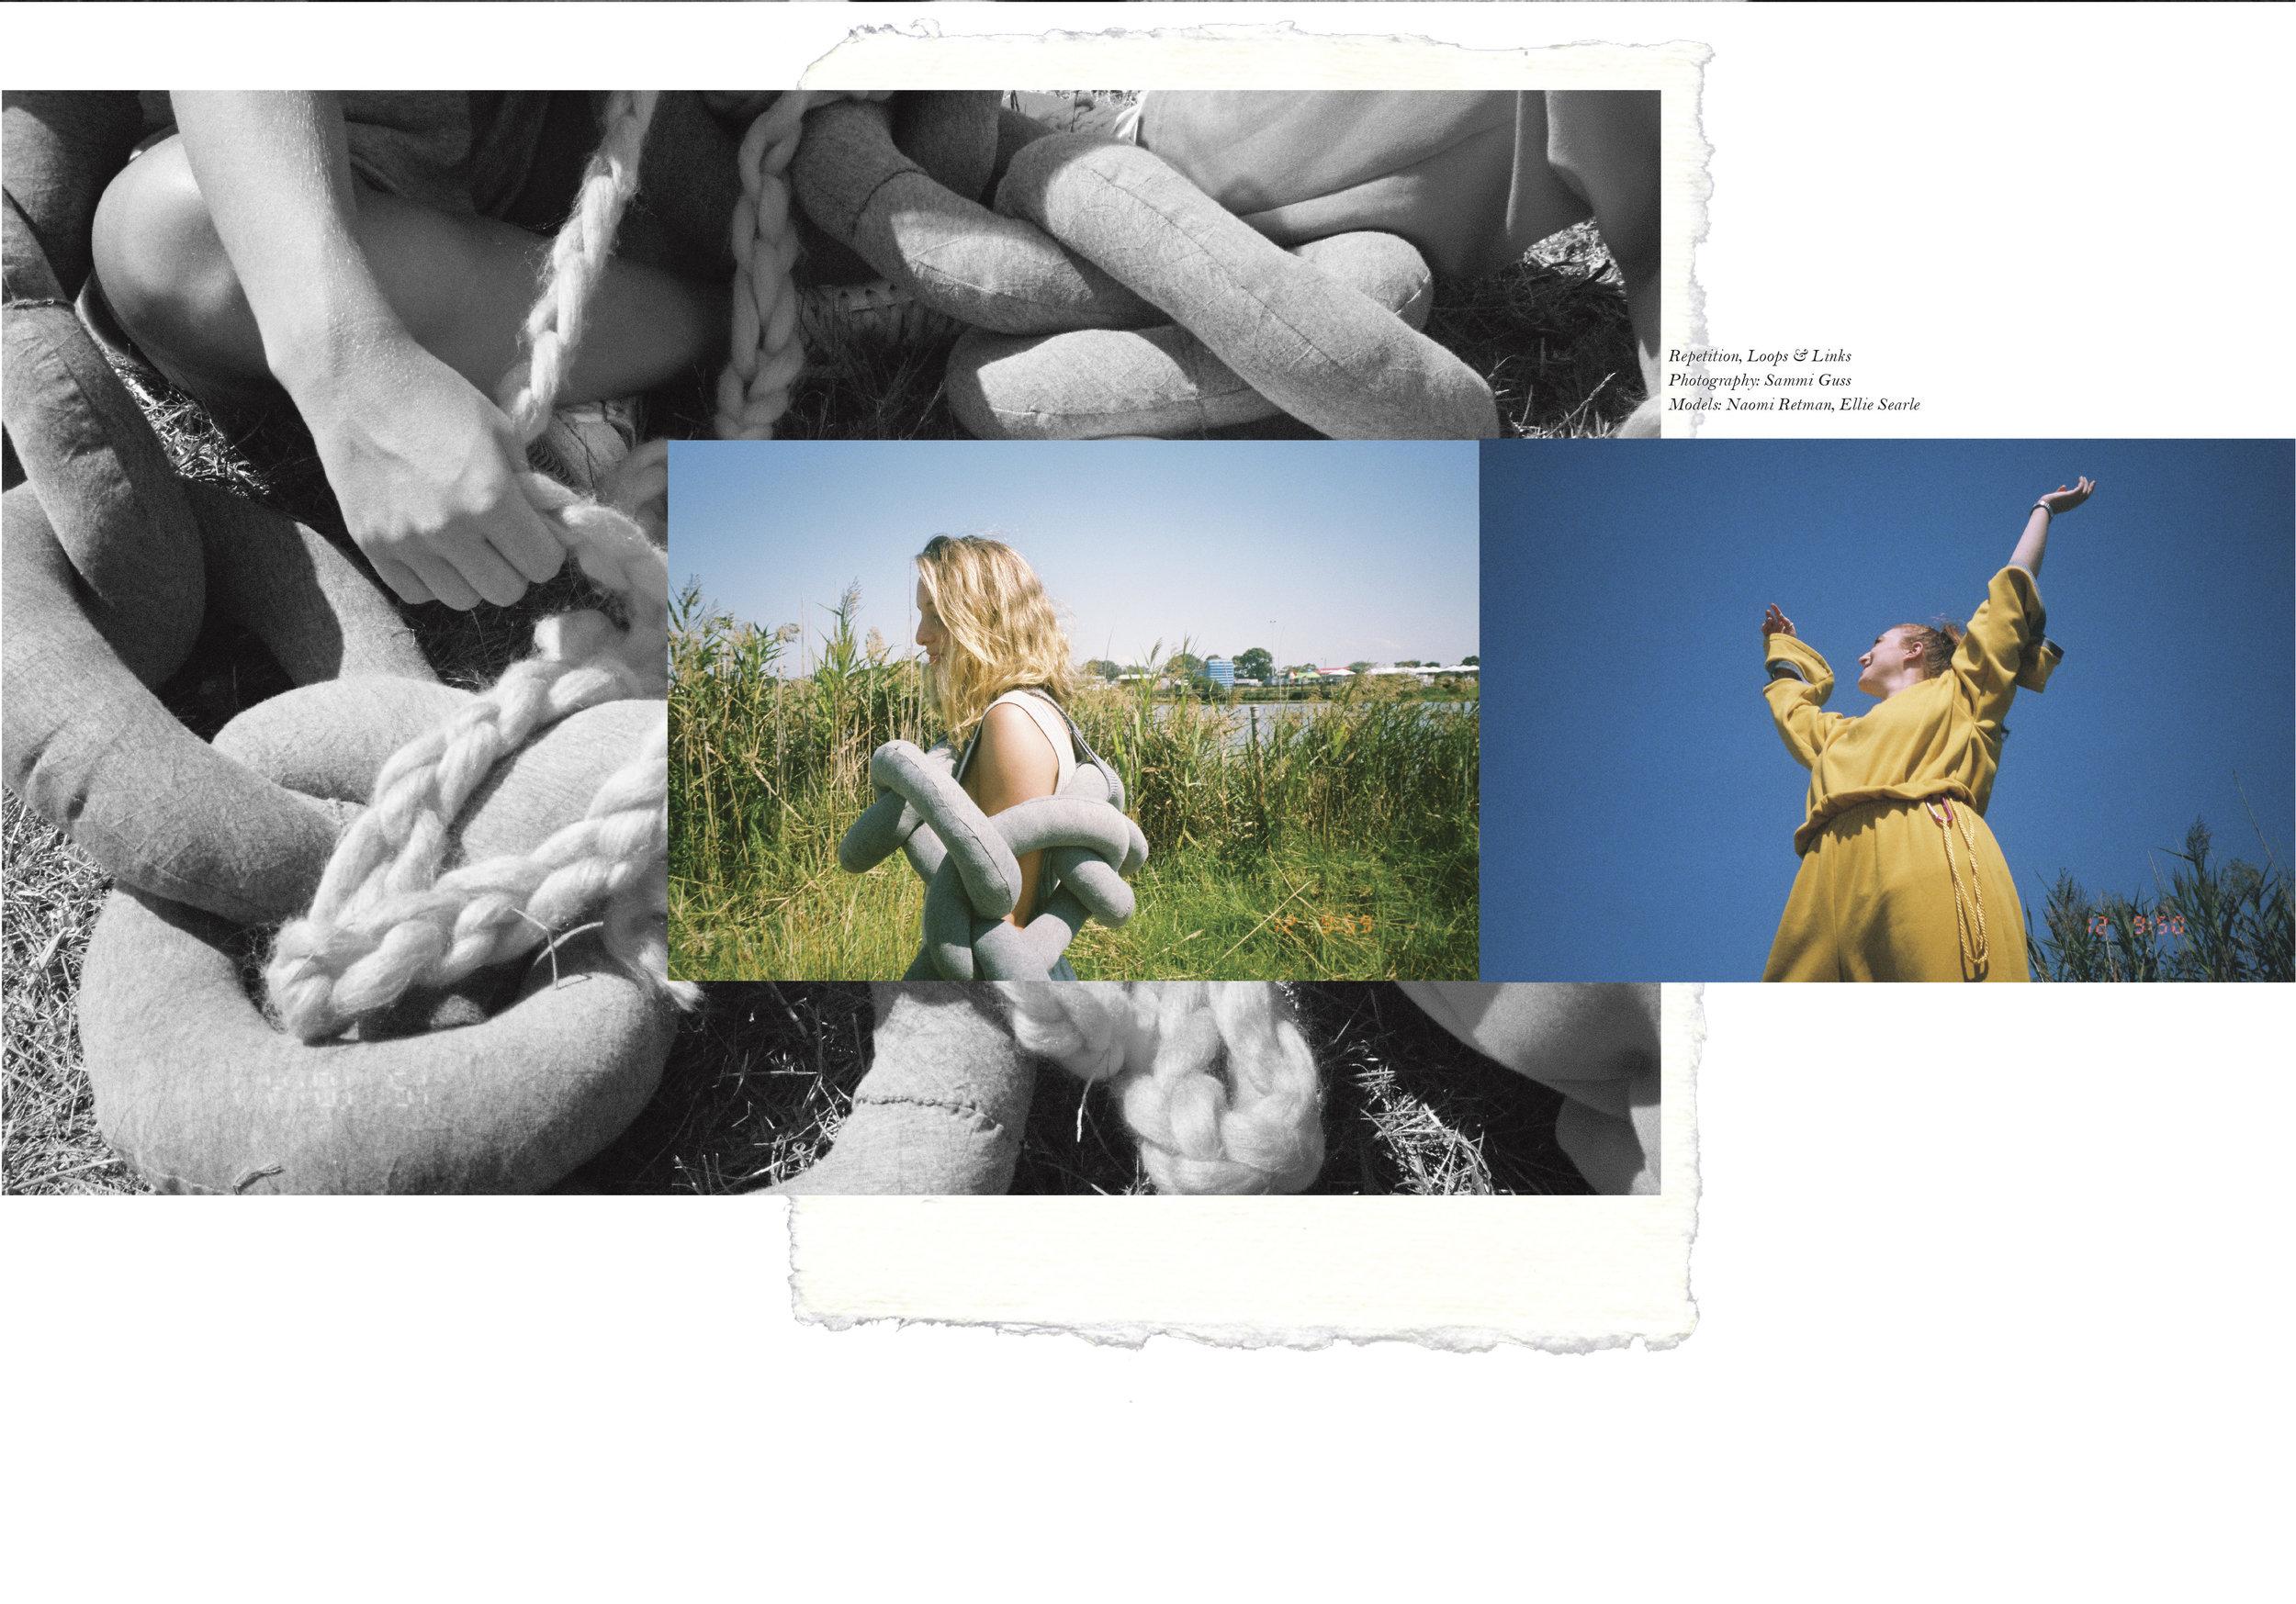 fol12.jpg